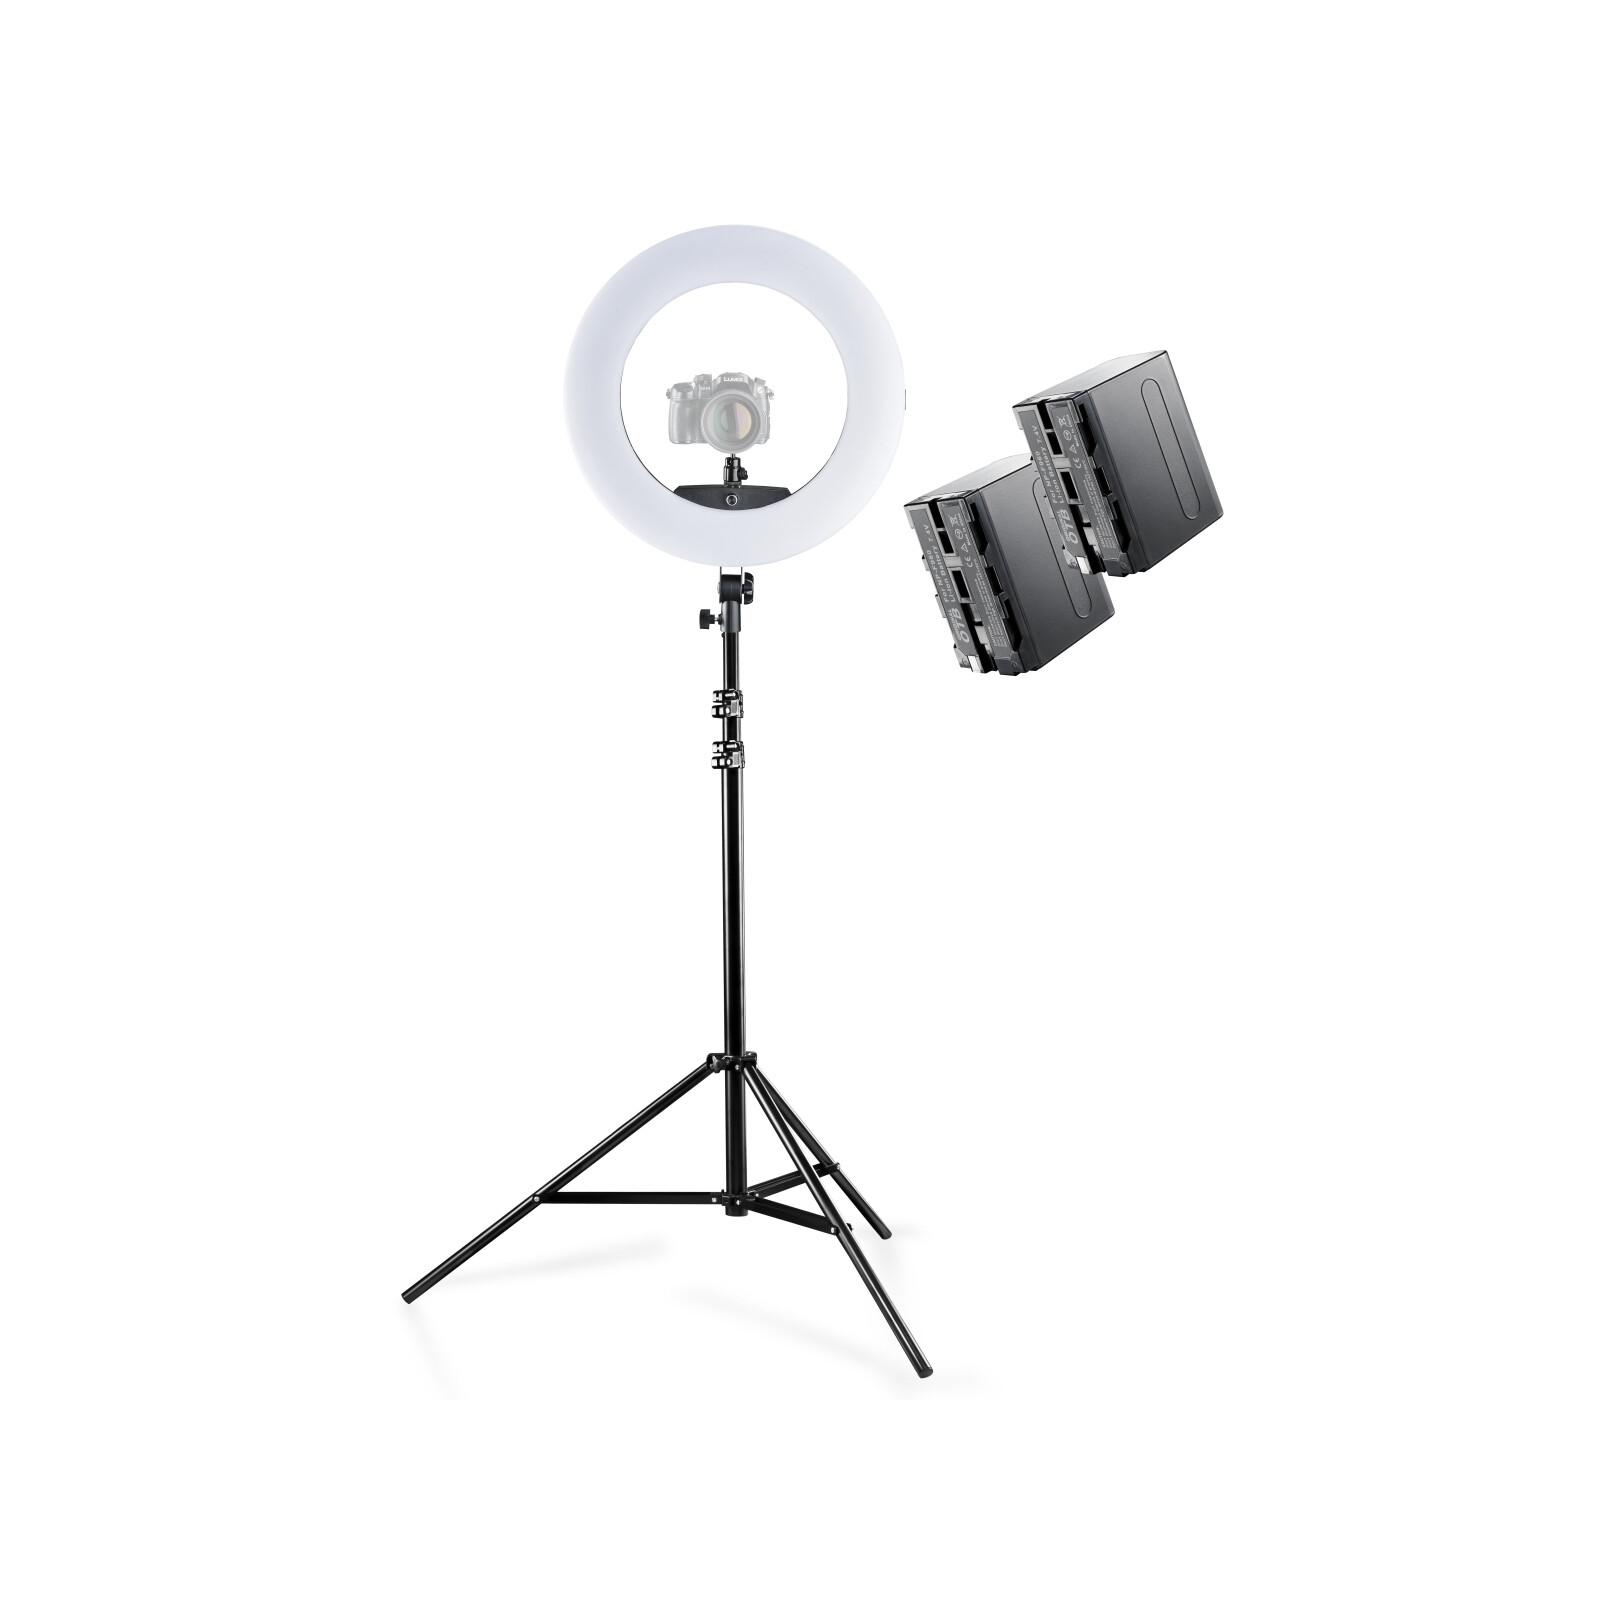 Walimex pro LED Ringleuchte Medow 960 Pro Set inkl. Lampenst